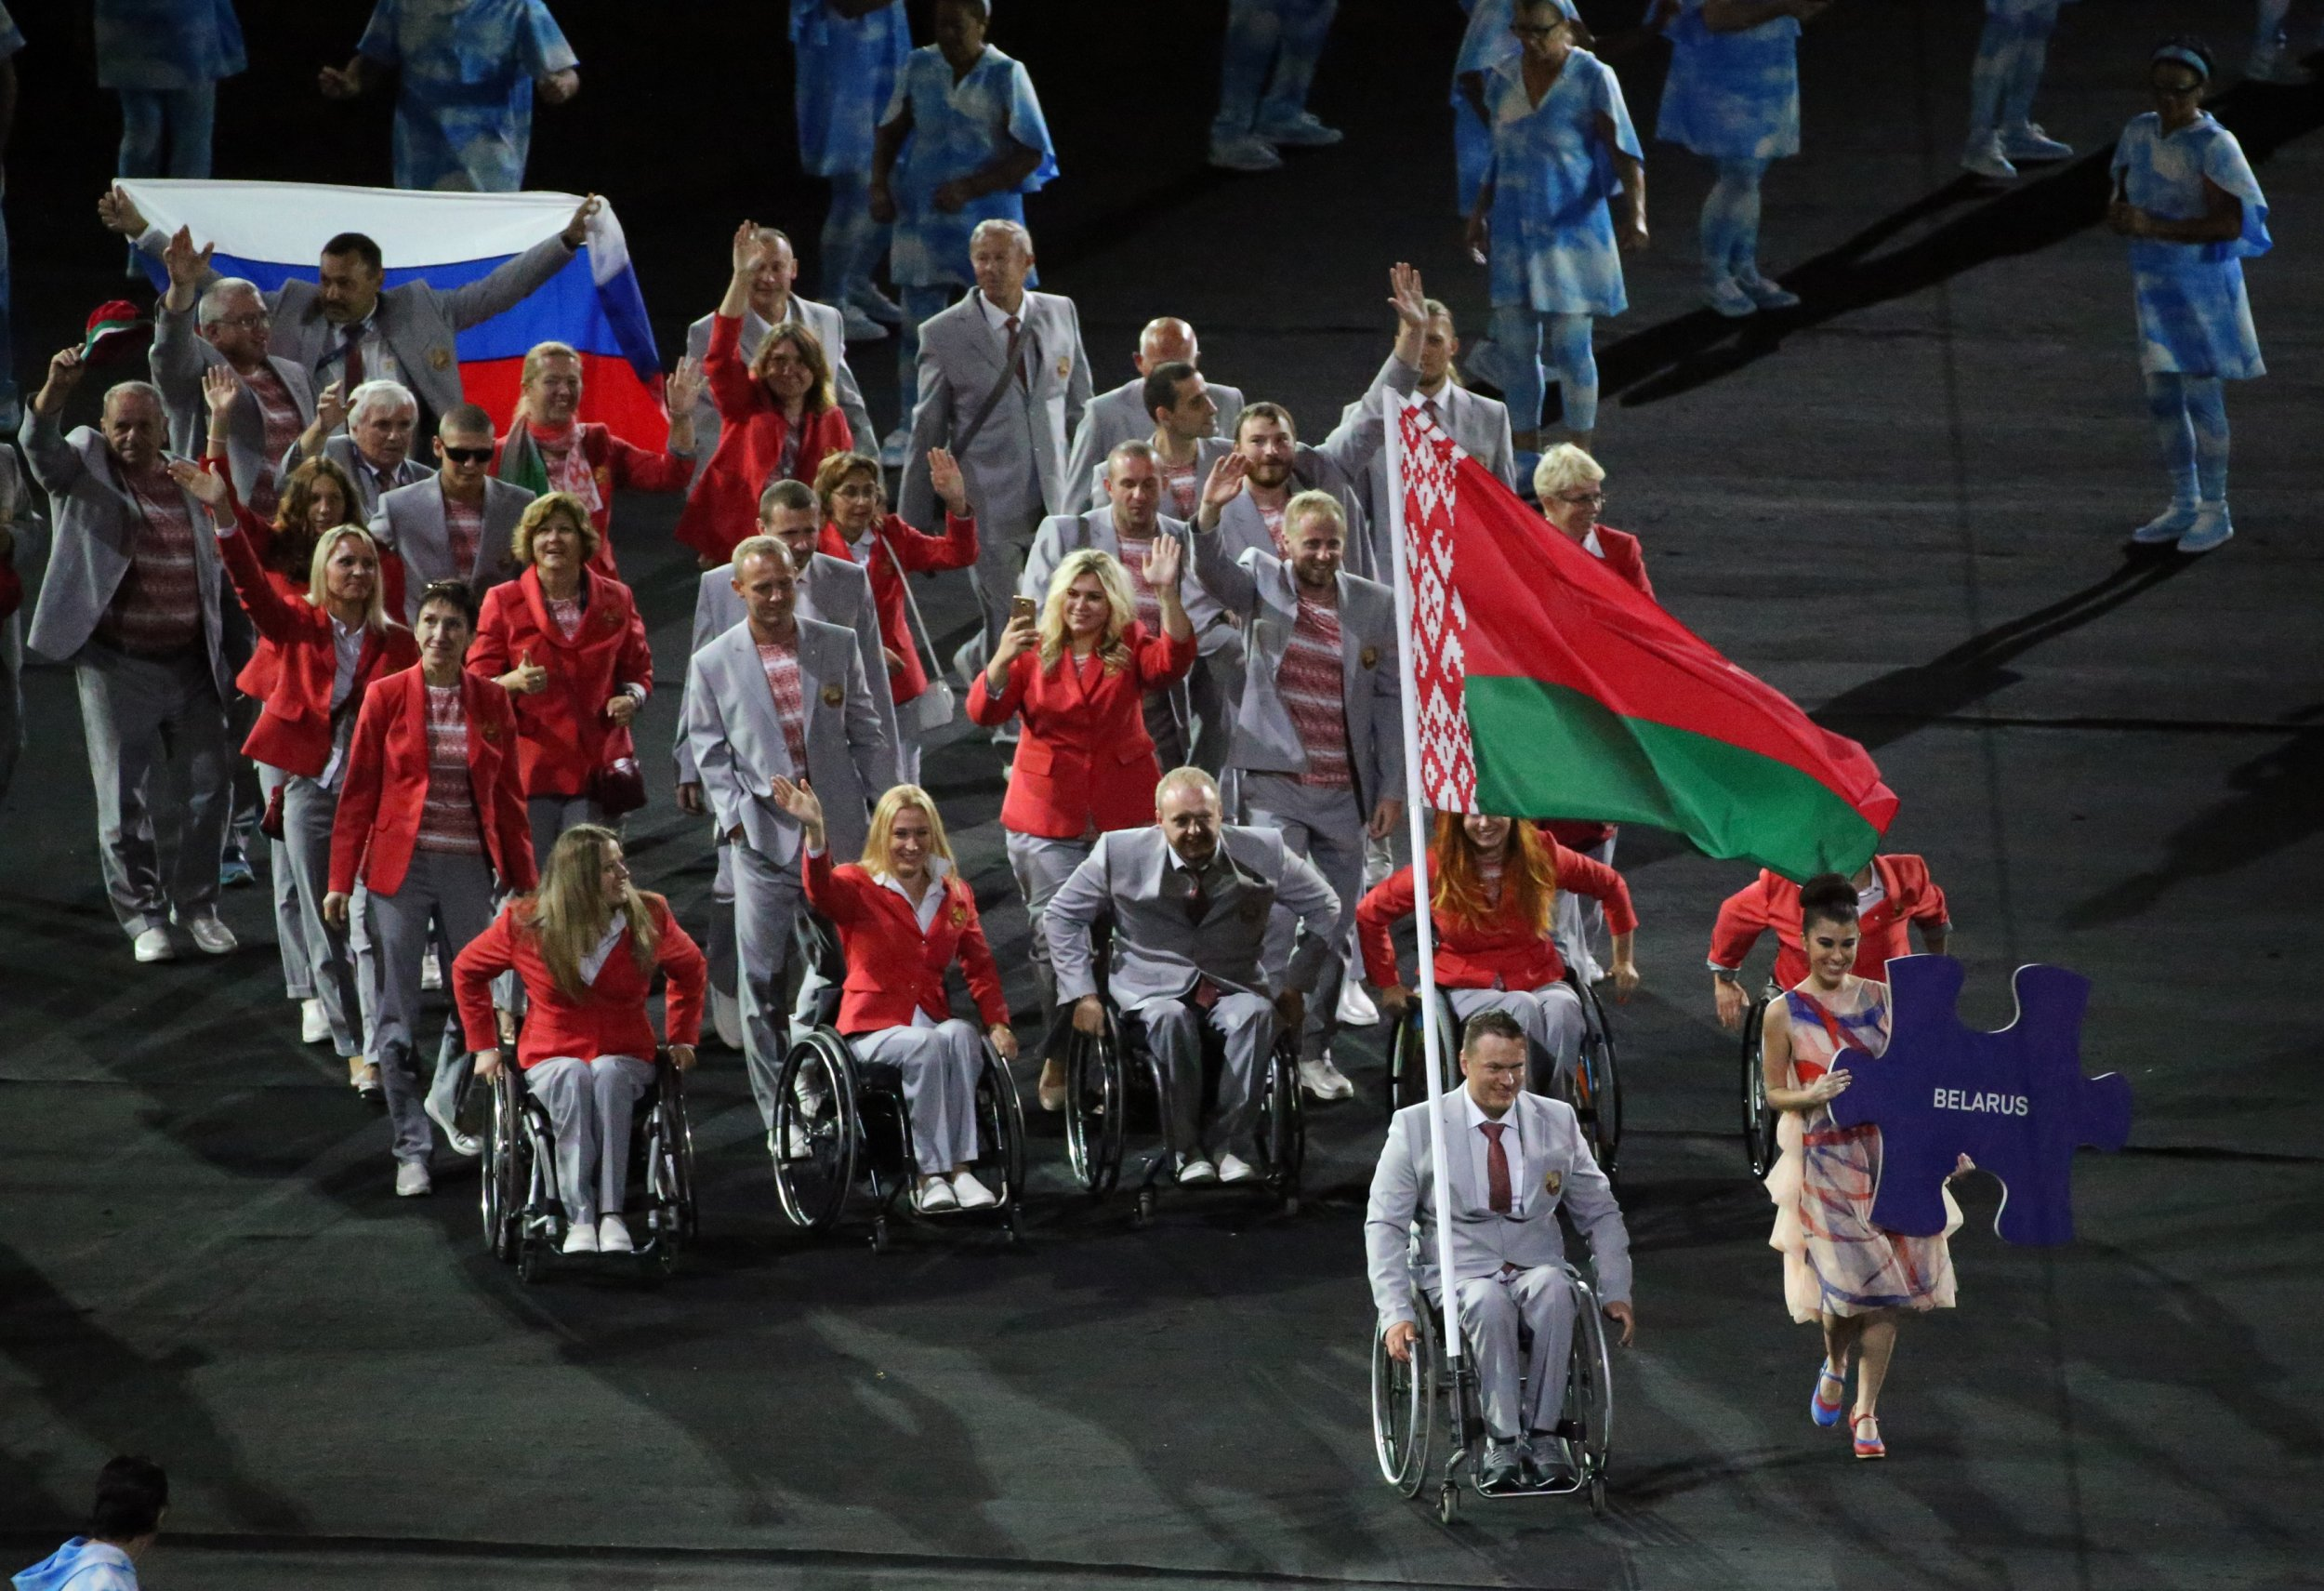 Belarus paralympians